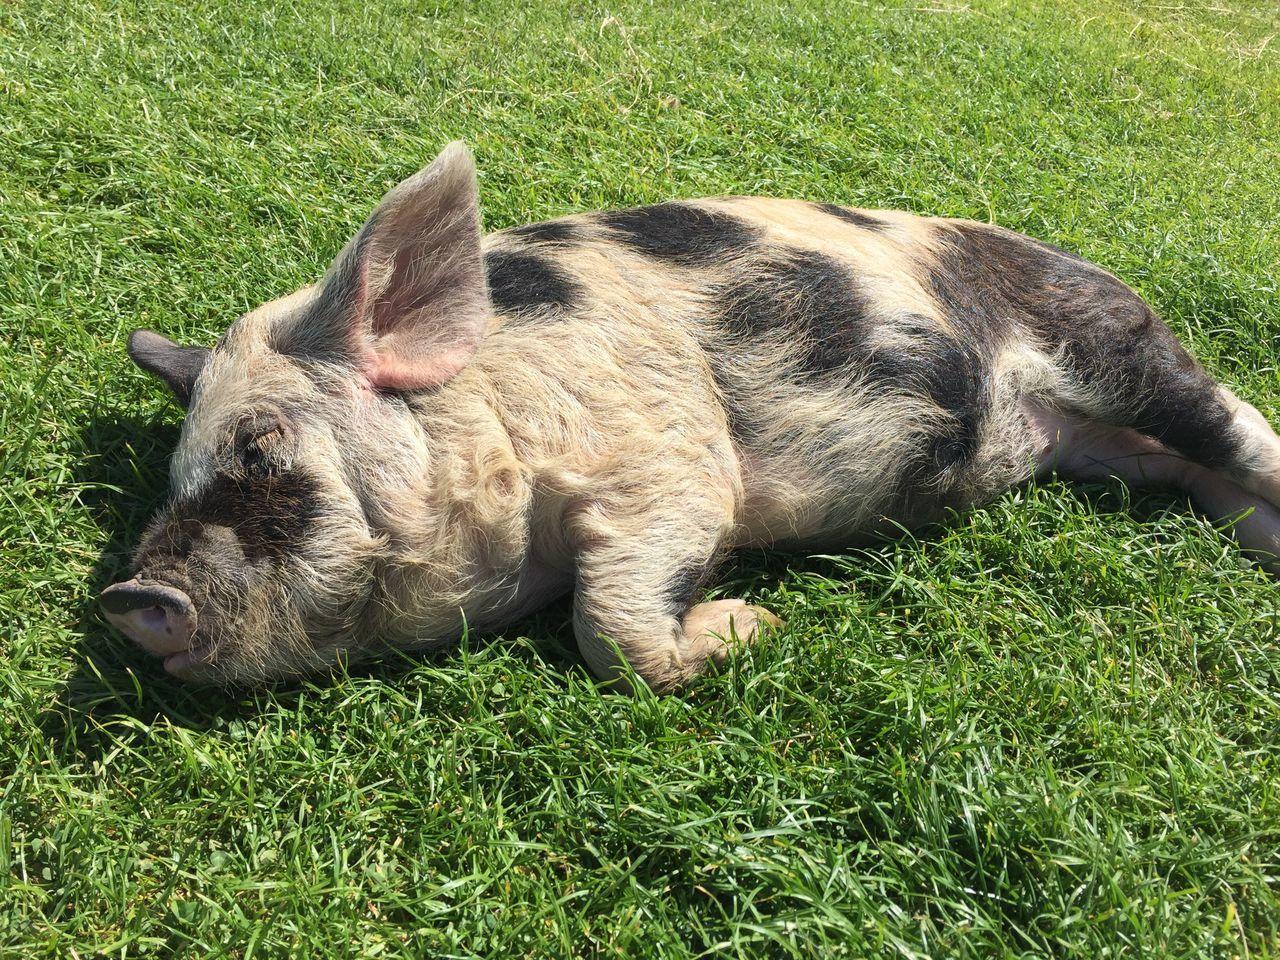 Pig Sleeping Pig Outdoors Fresh On Eyeem  Lazy Day Sunbathing Animal Themes